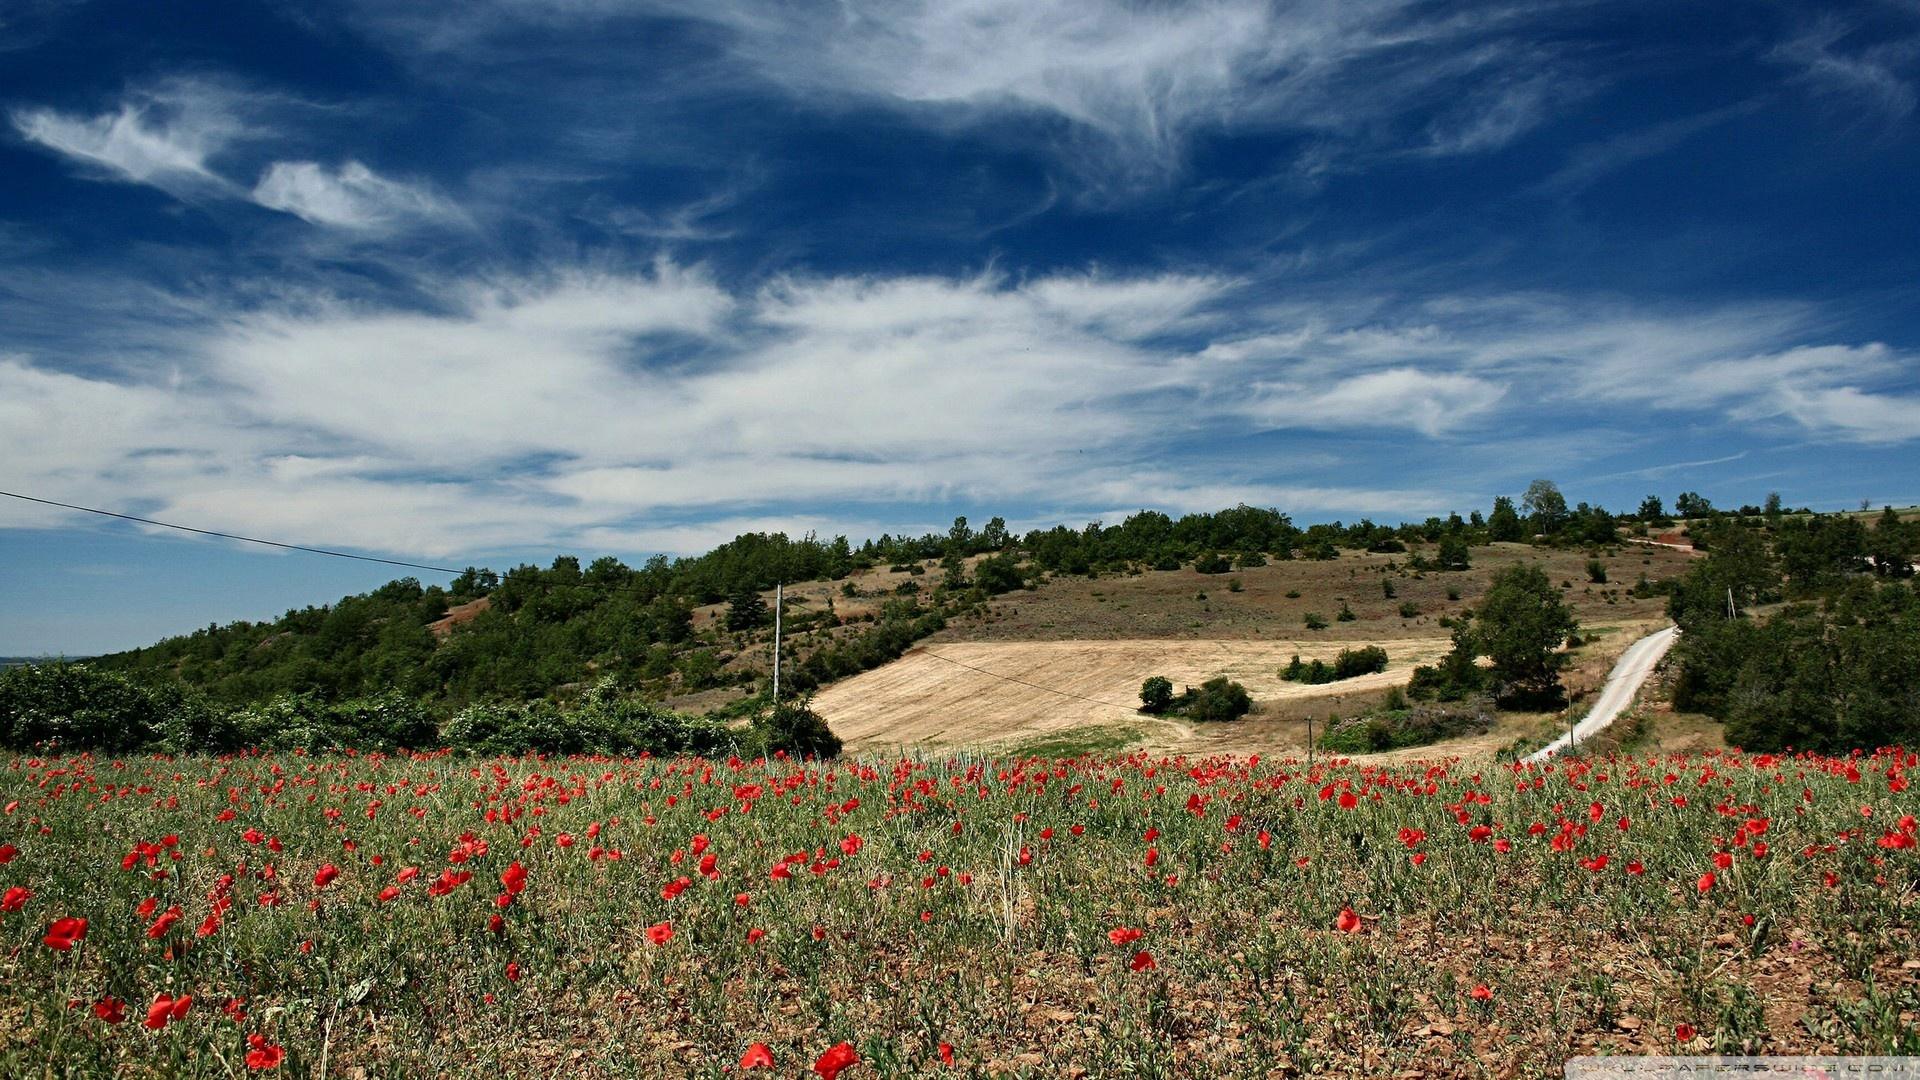 Field Of Poppies 1 Wallpaper 1920x1080 Field Of Poppies 1 1920x1080